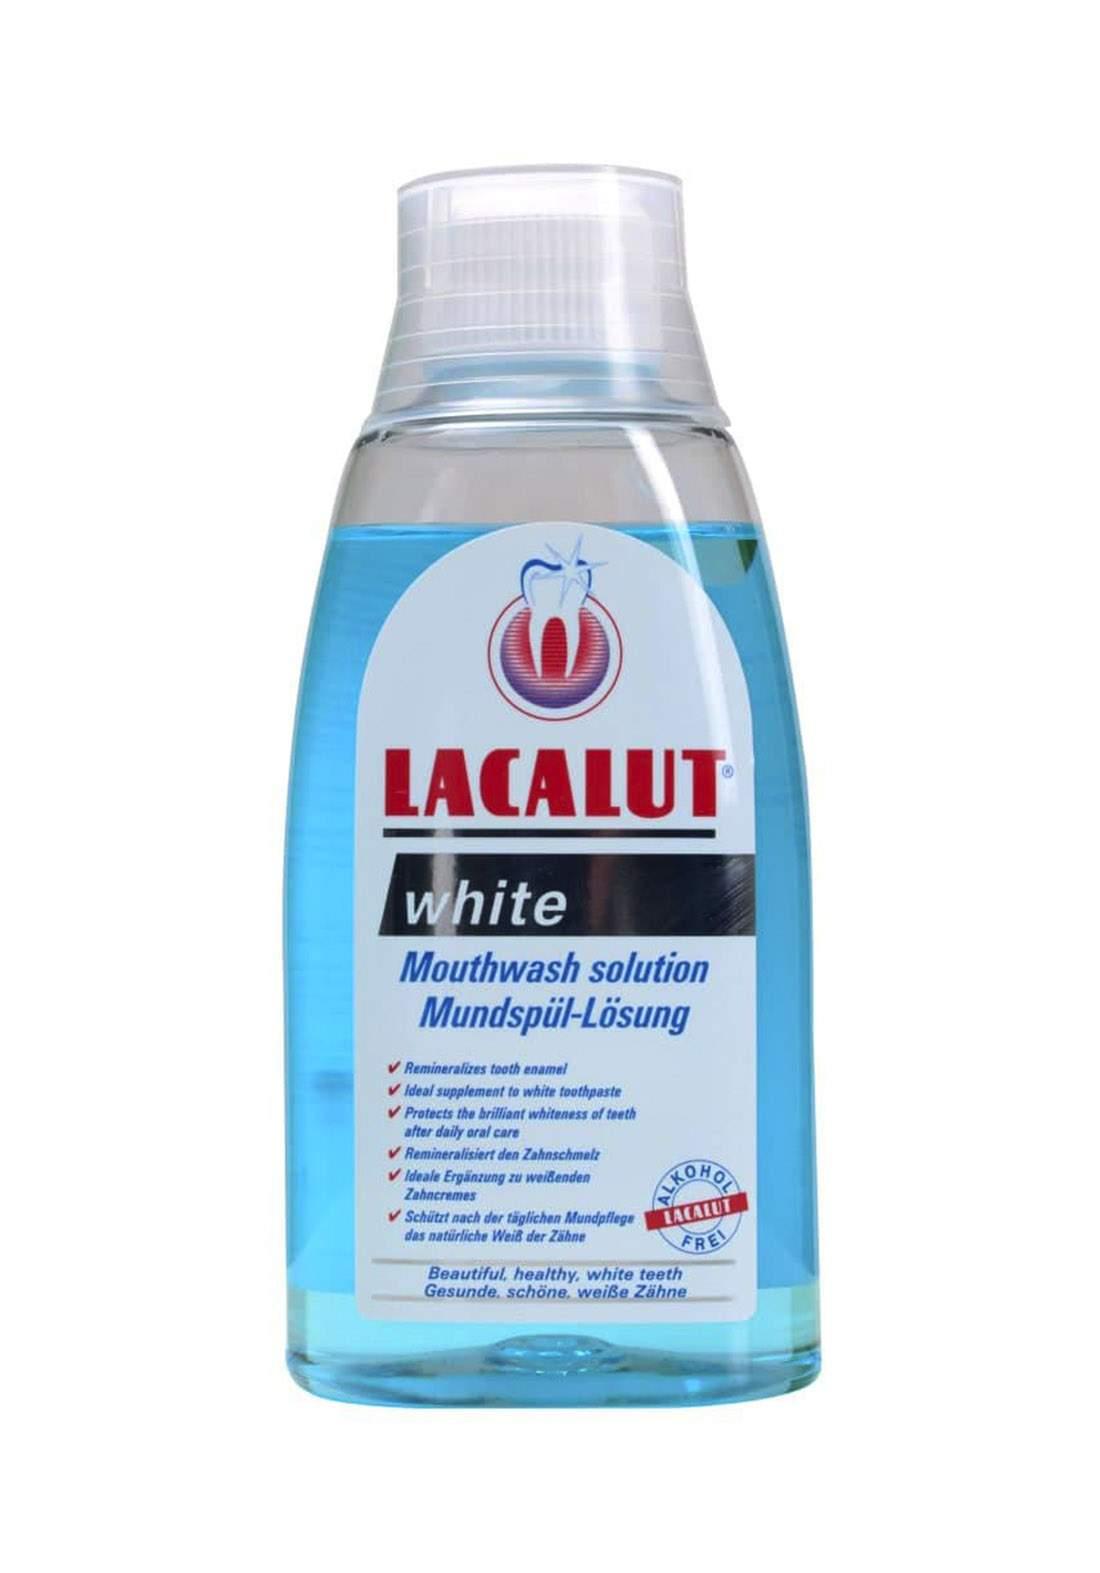 Lacalut Sensitive Antiplate Mouthwash 300ml Crushed غسول فم